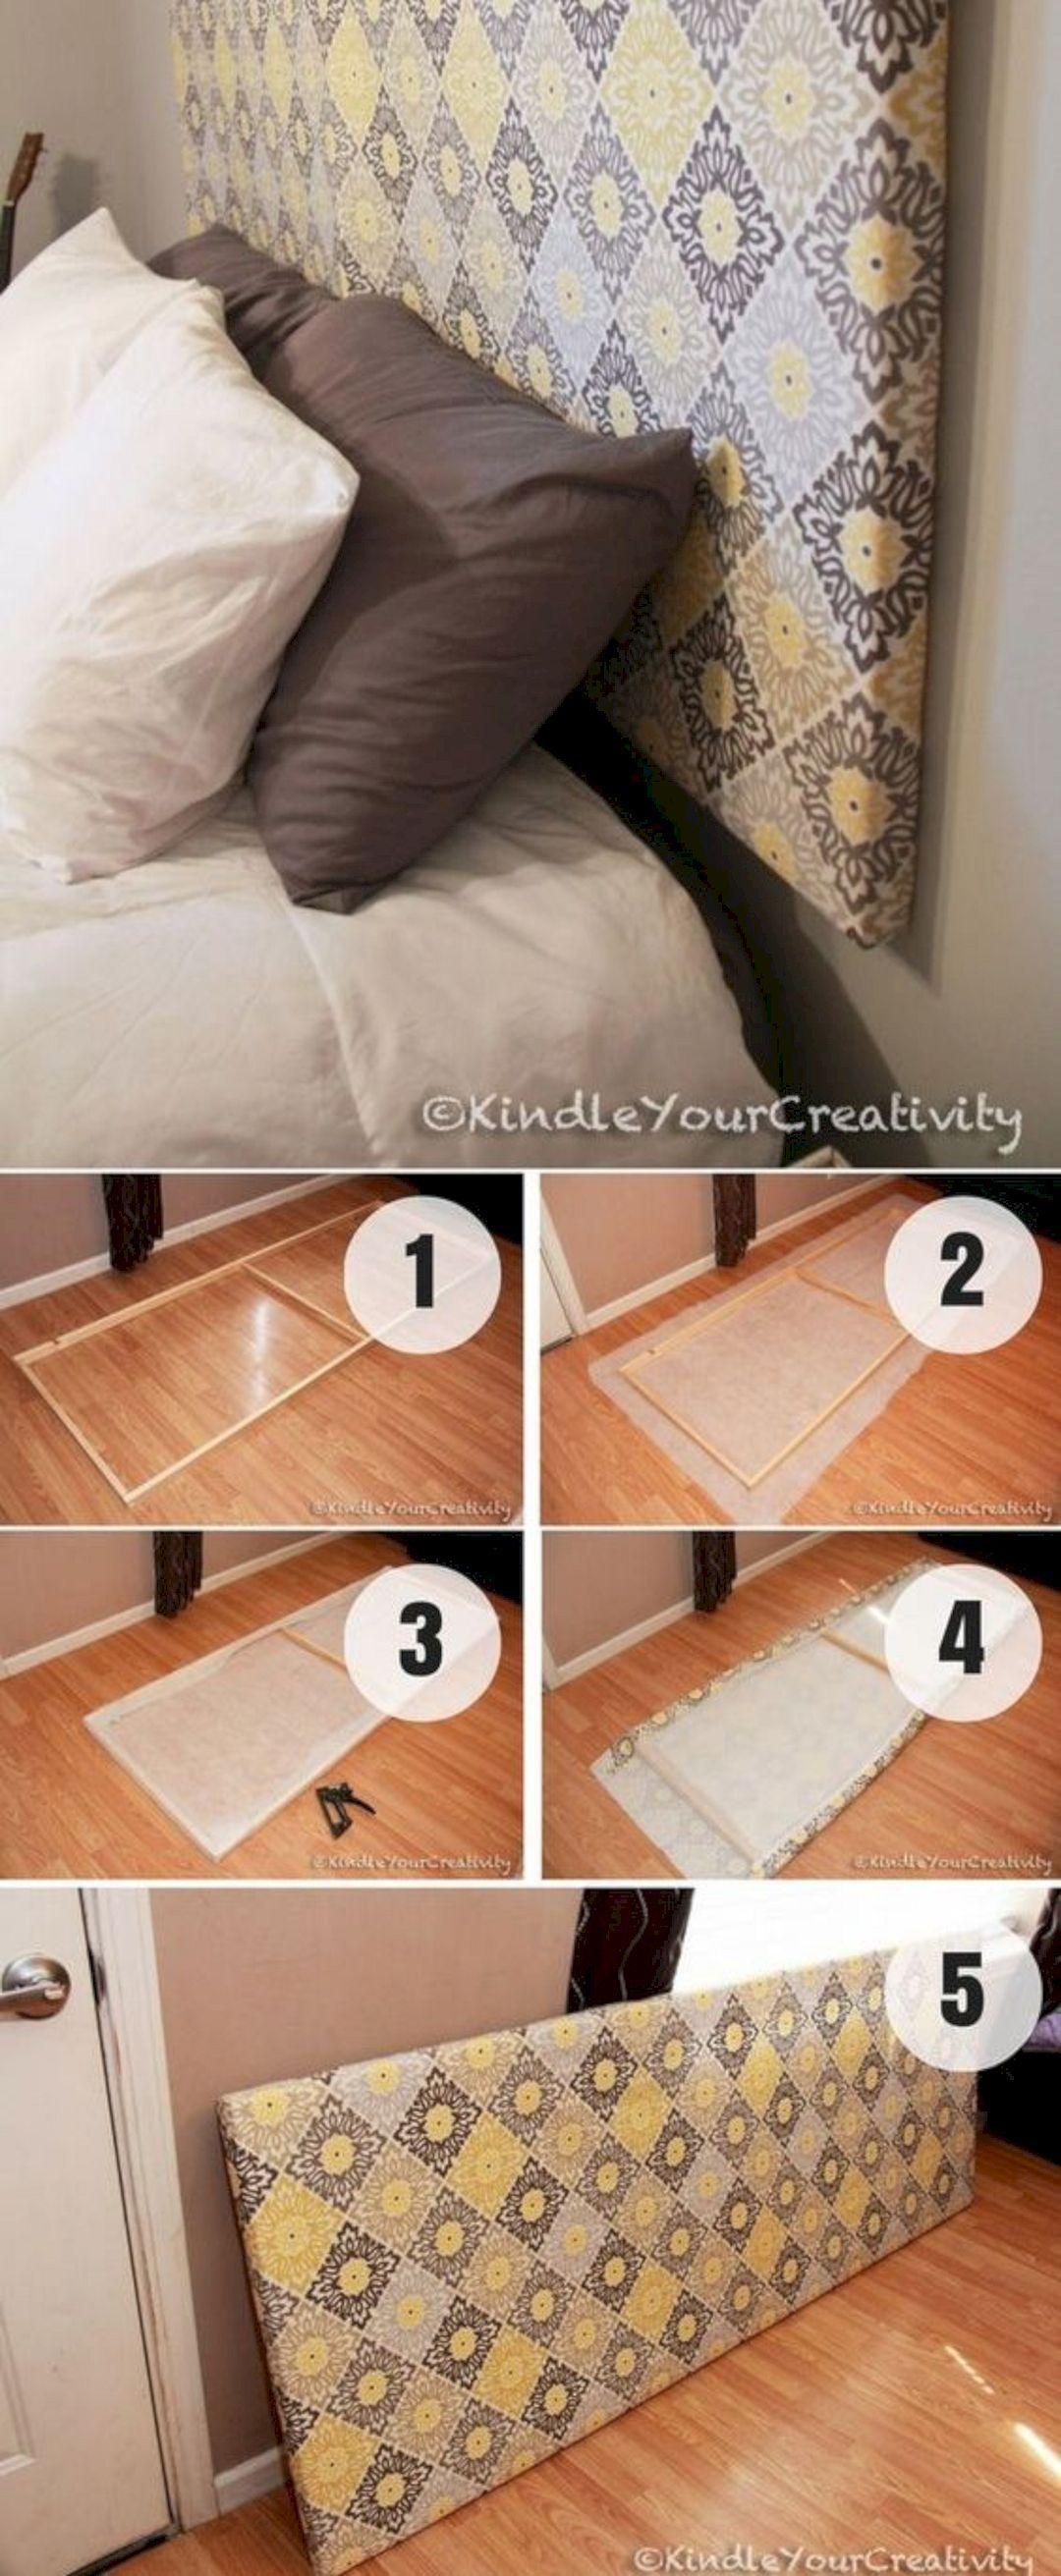 15 Easy DIY Headboard Project Ideas (mit Bildern) Dekor